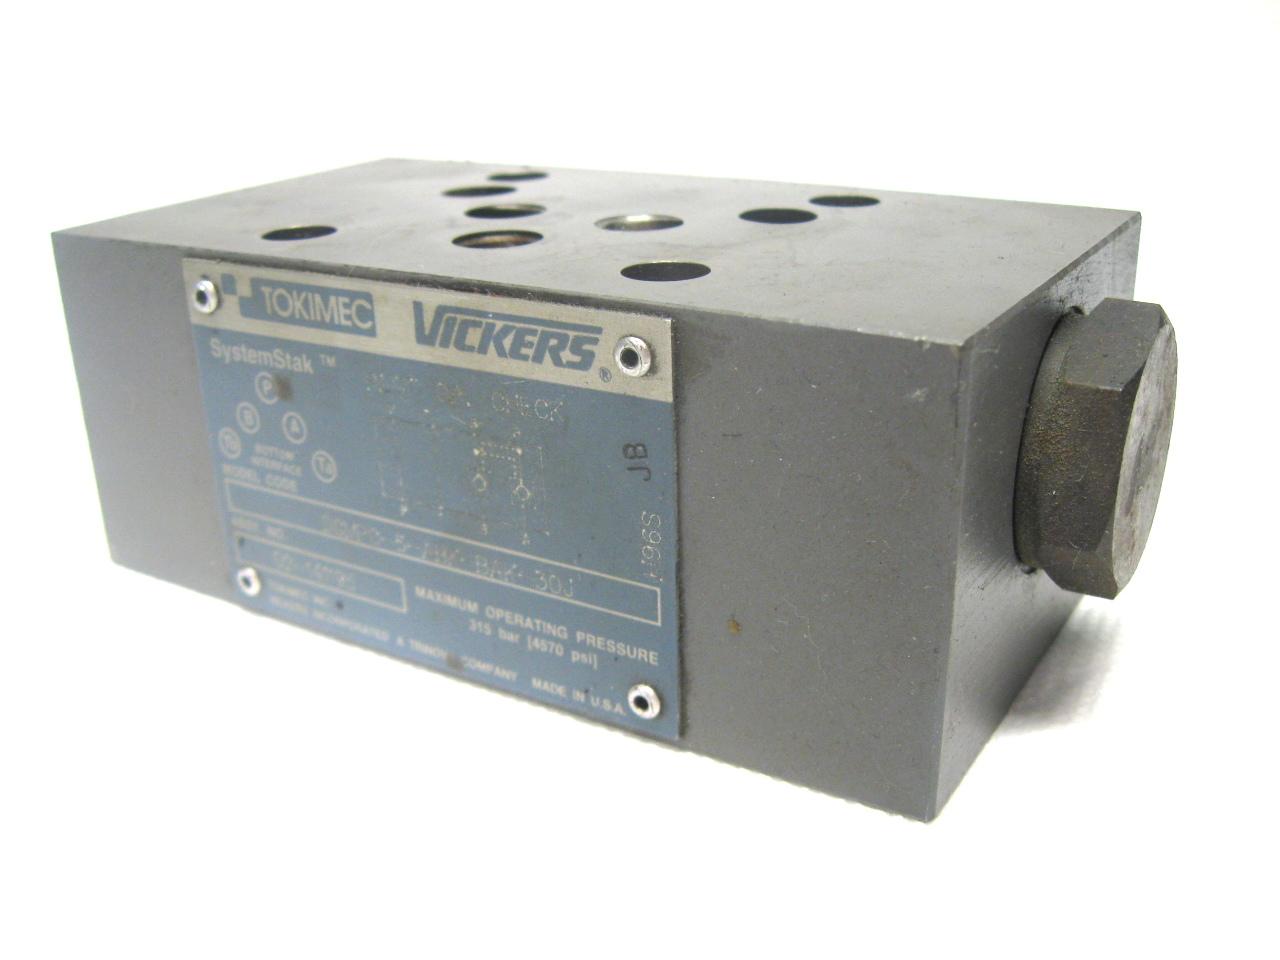 Tokimec Vickers DGMPC-5-ABK-BAK-30J Reversible Hydraulic Check Valve 4570 PSI